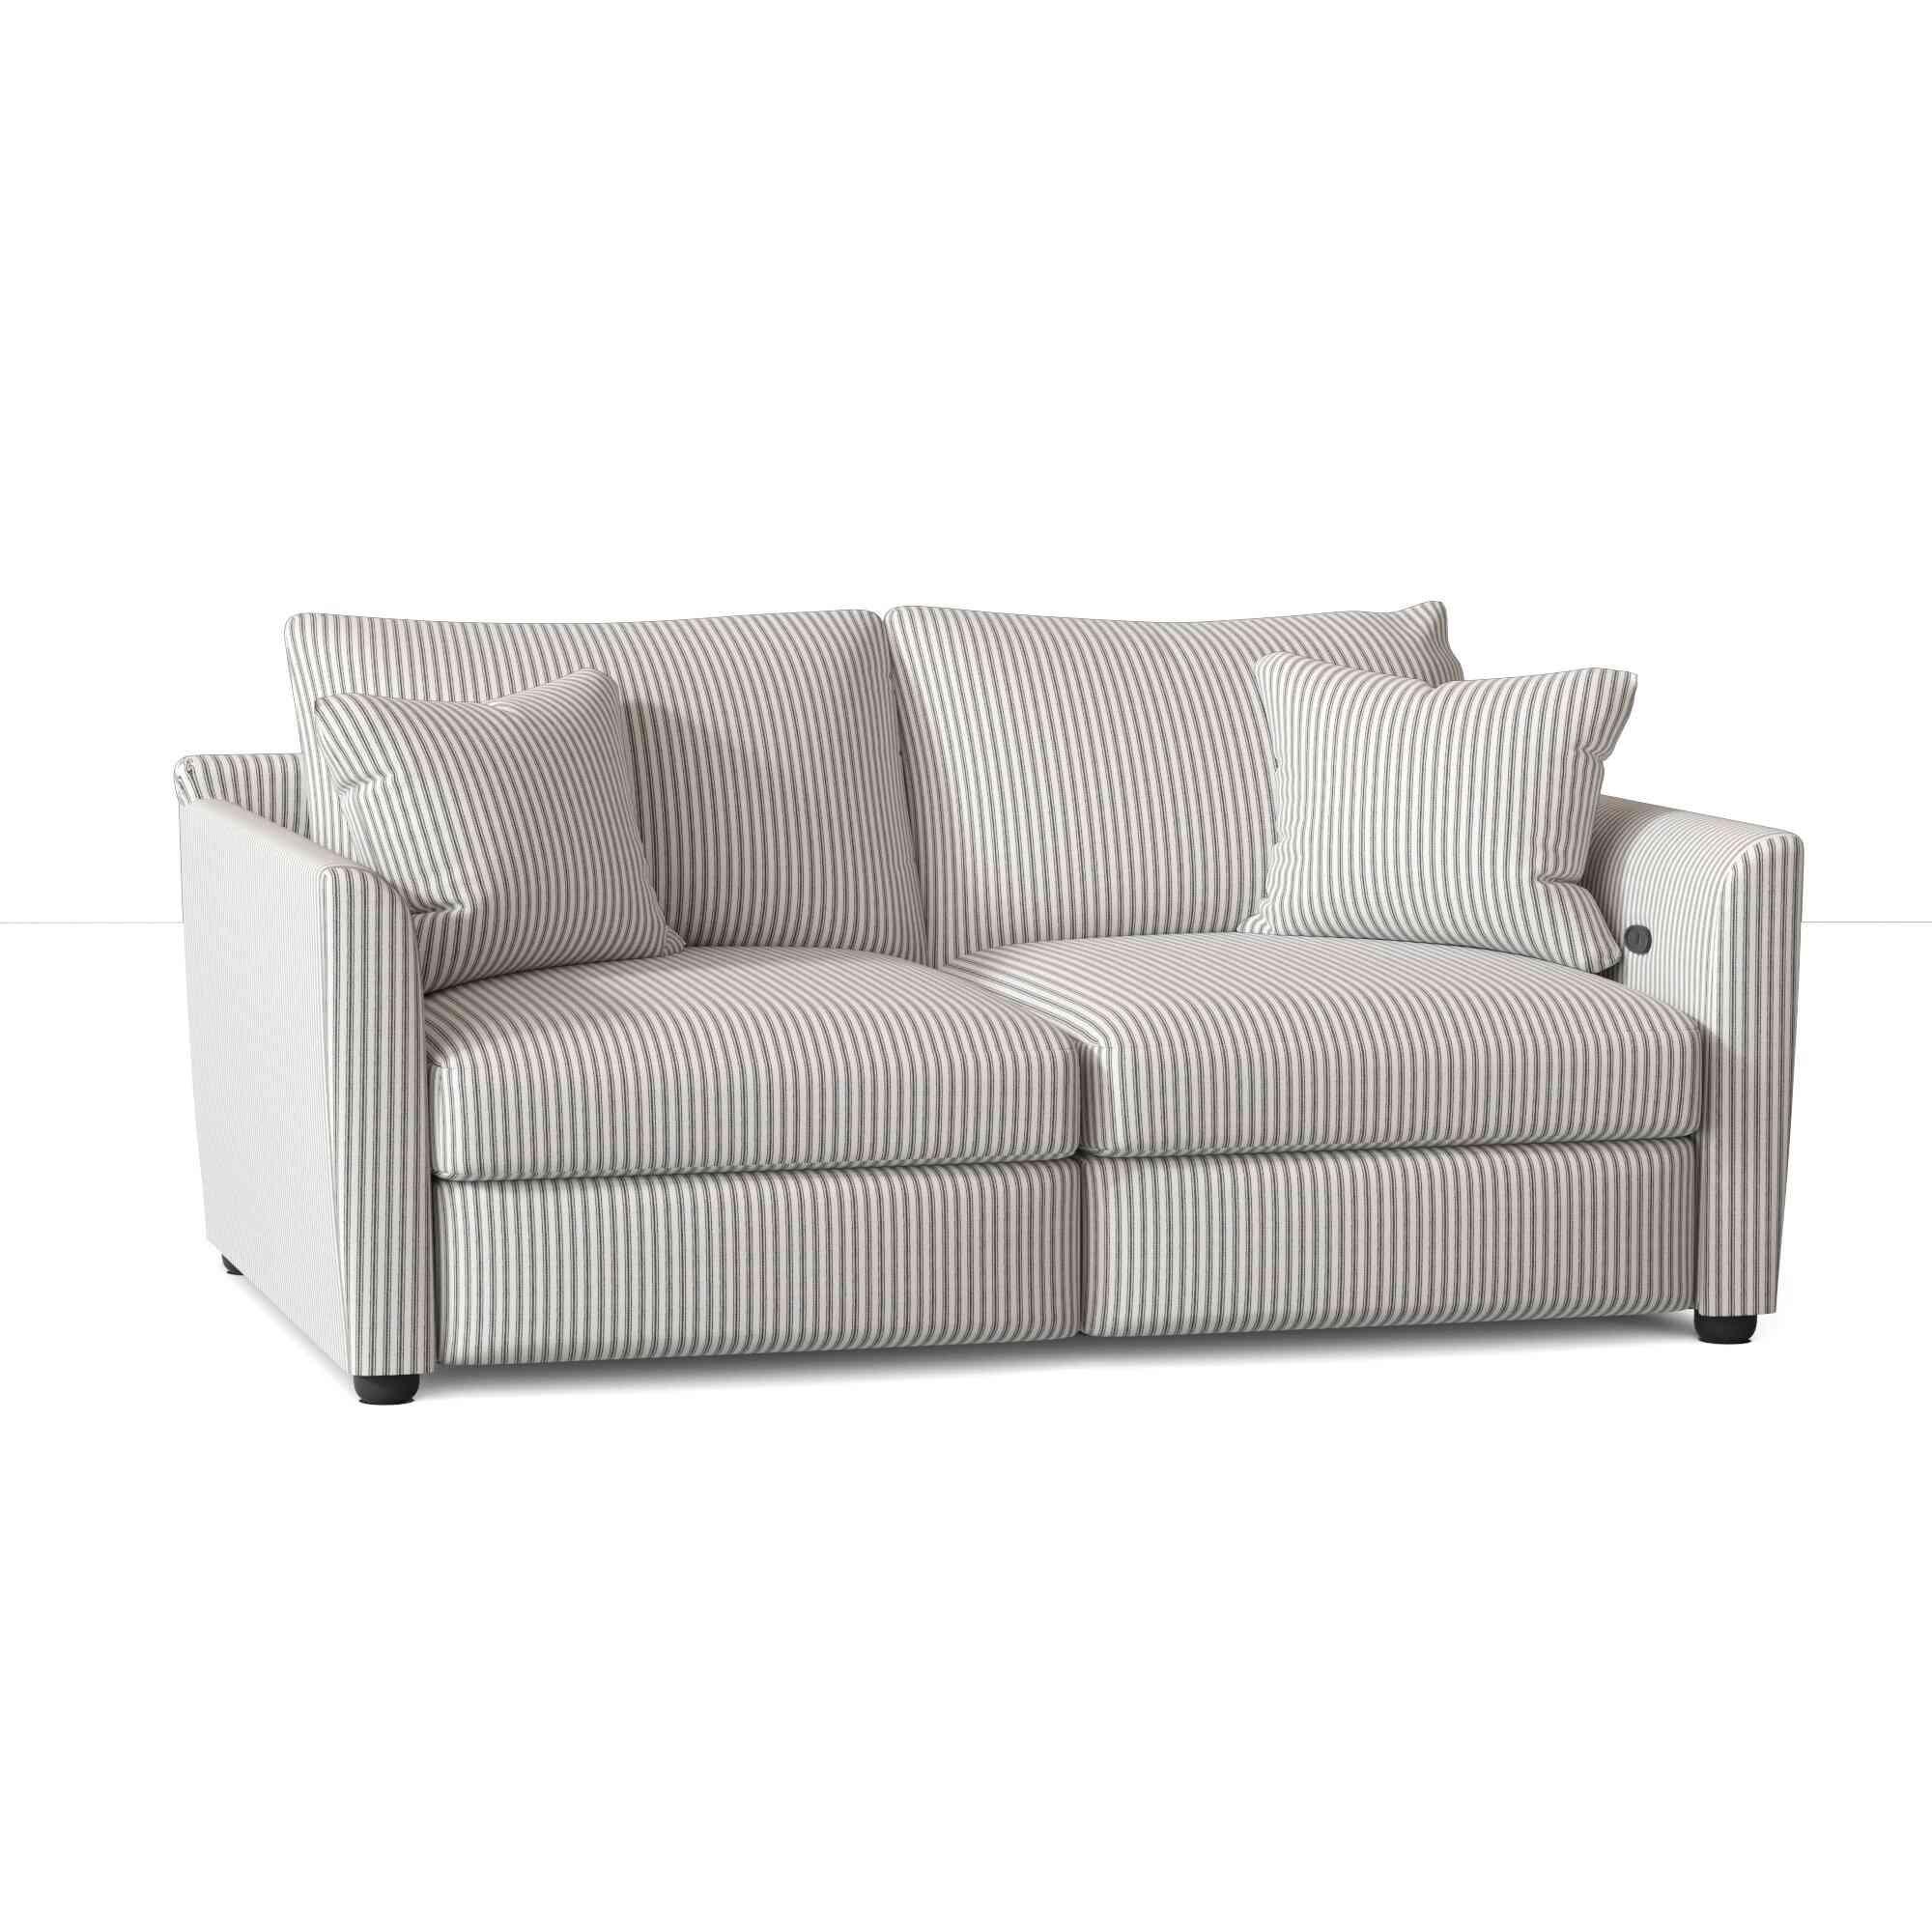 "Wayfair Custom Upholstery Georgia 61"" Flared Arm Reclining"